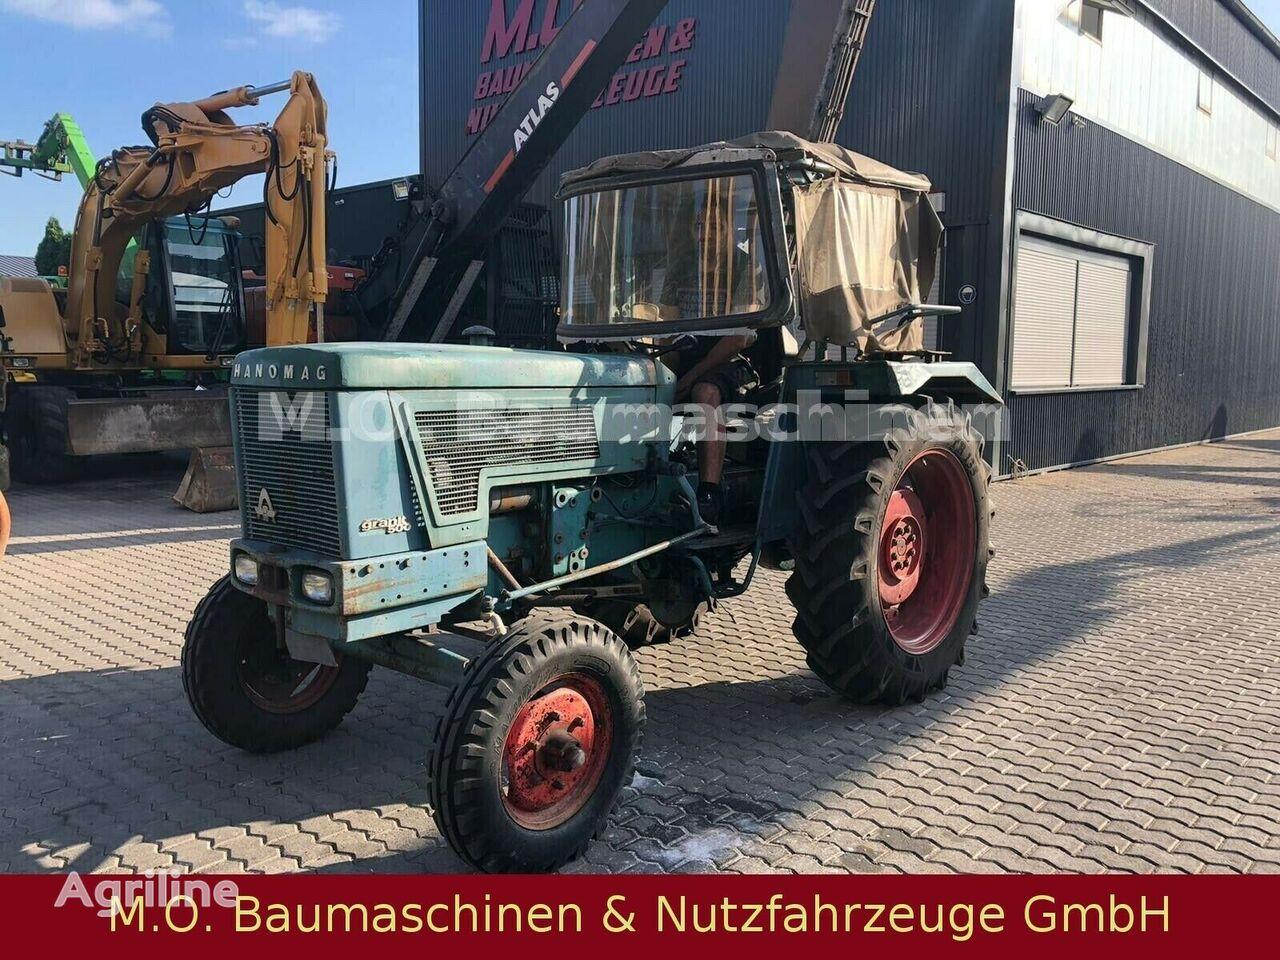 HANOMAG Granit 501 wheel tractor